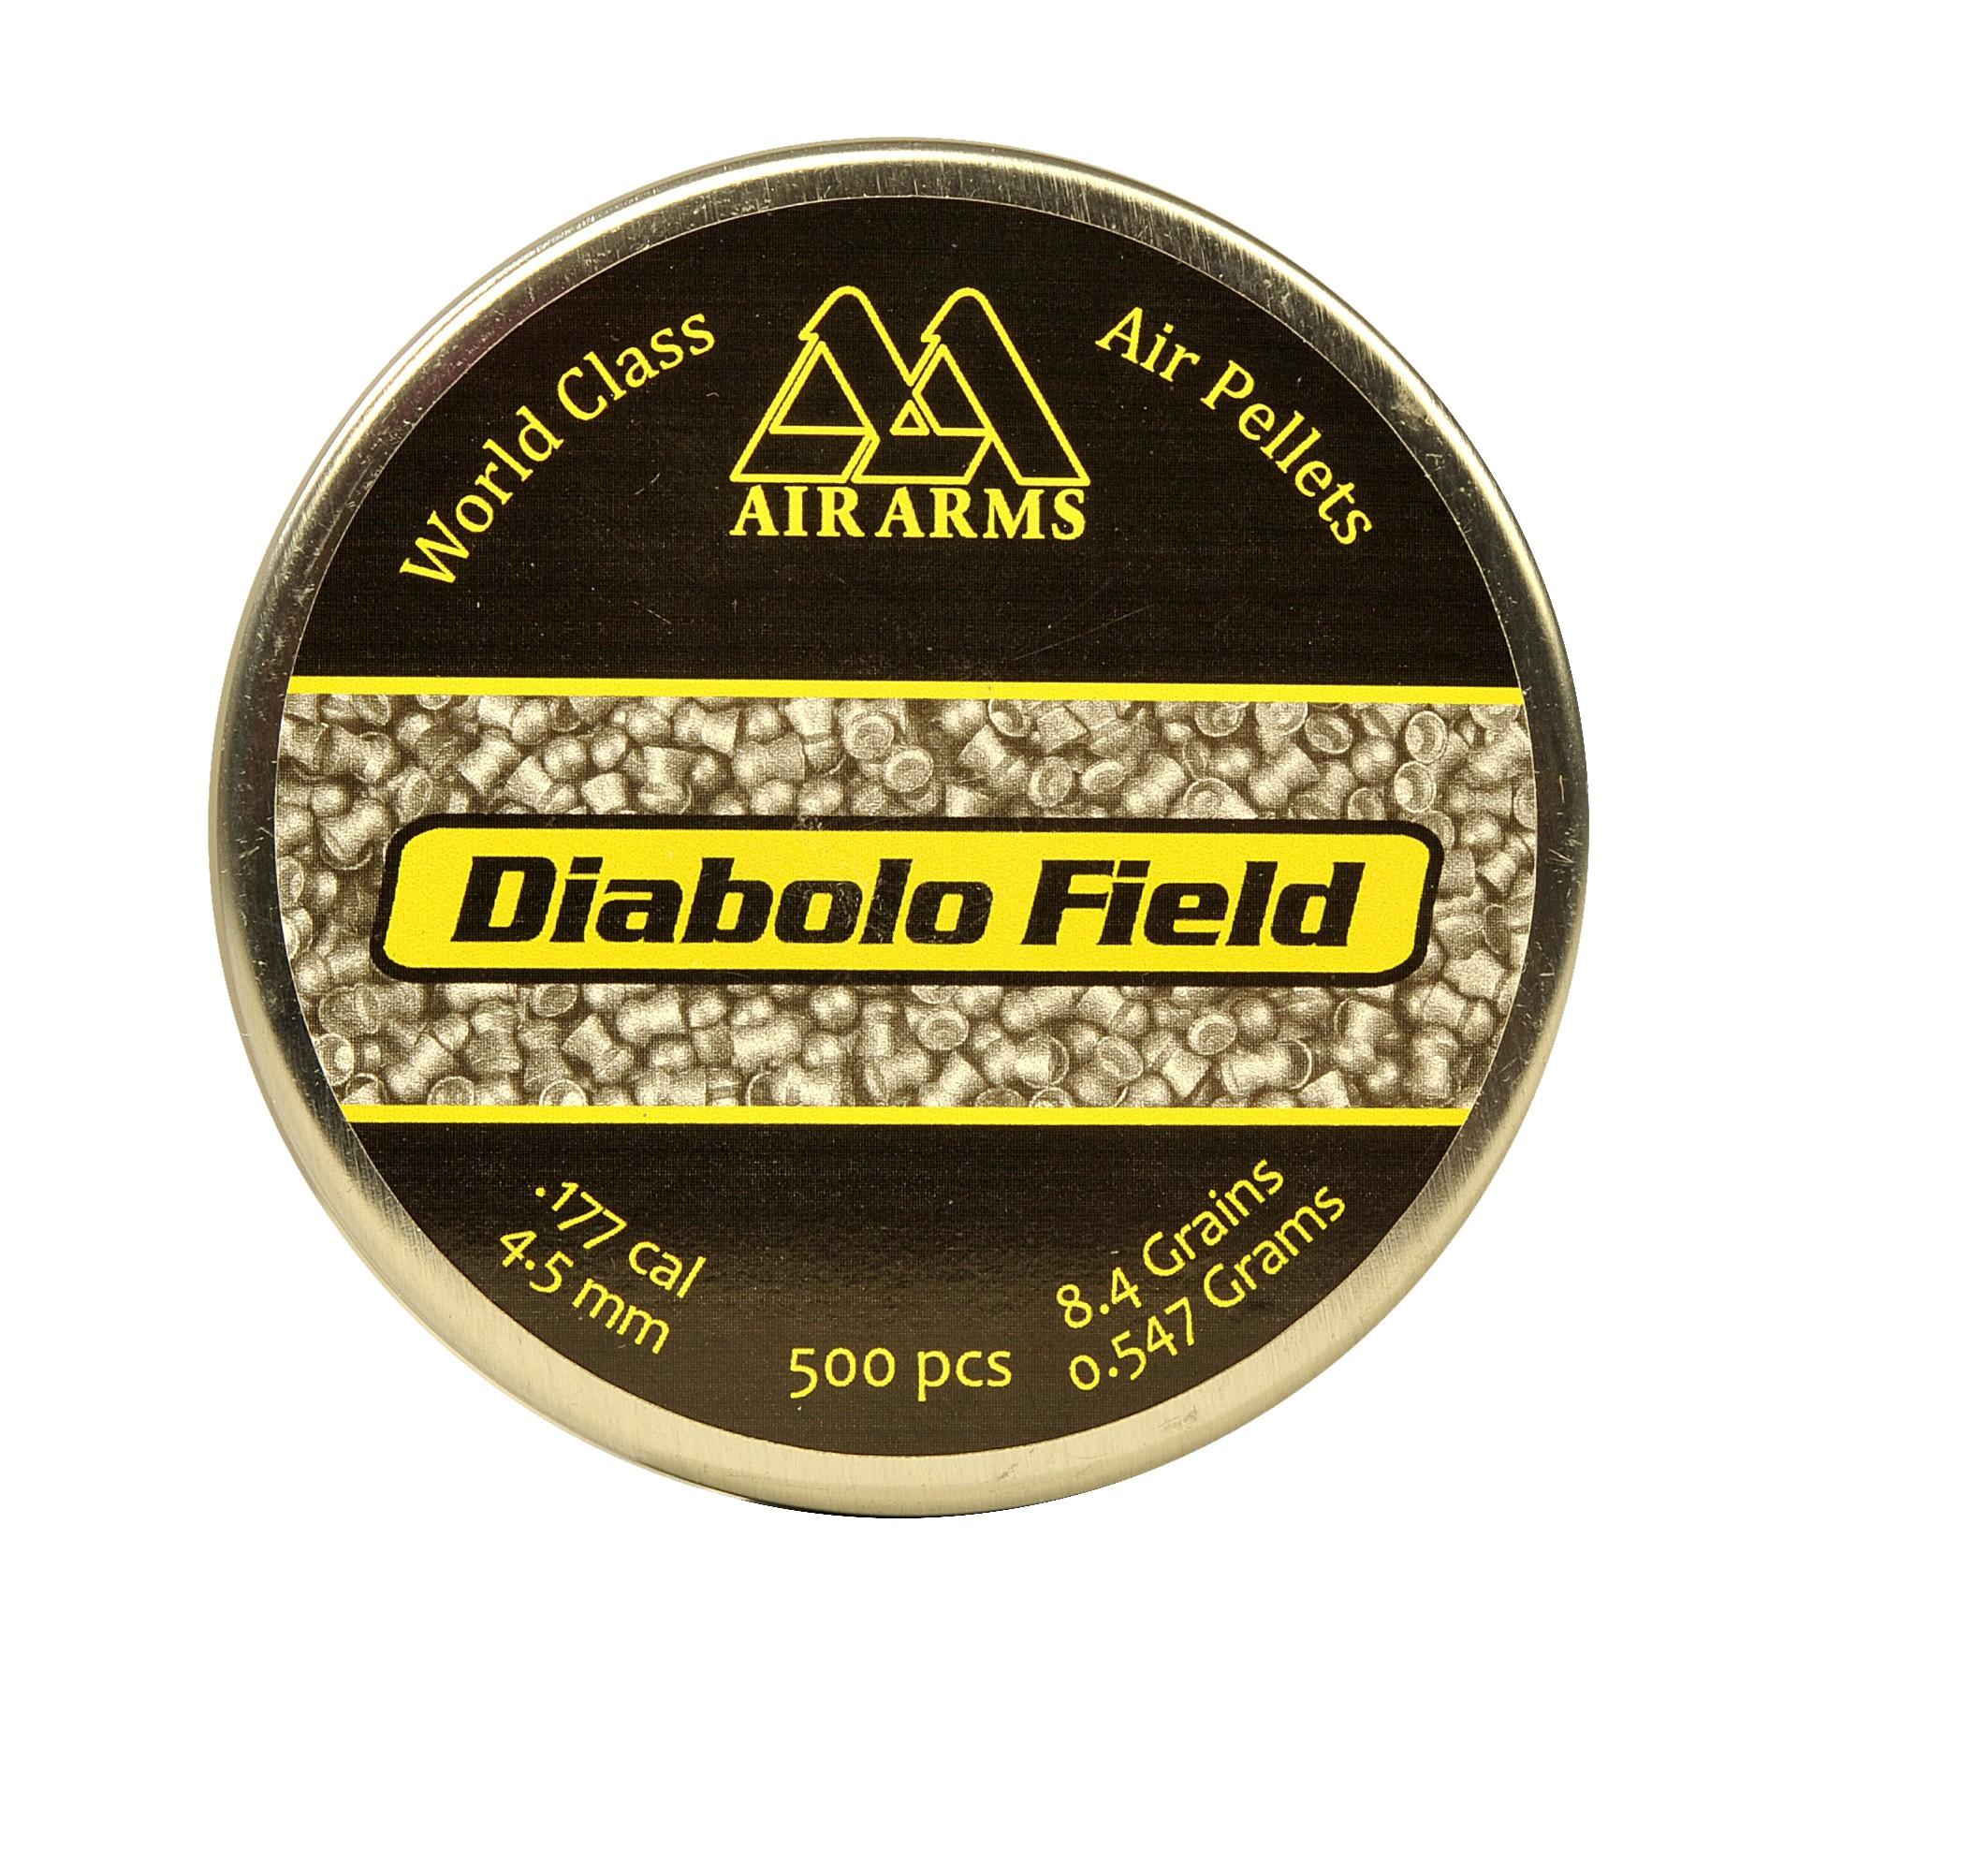 Pellets .22 Air Arms Diablo field